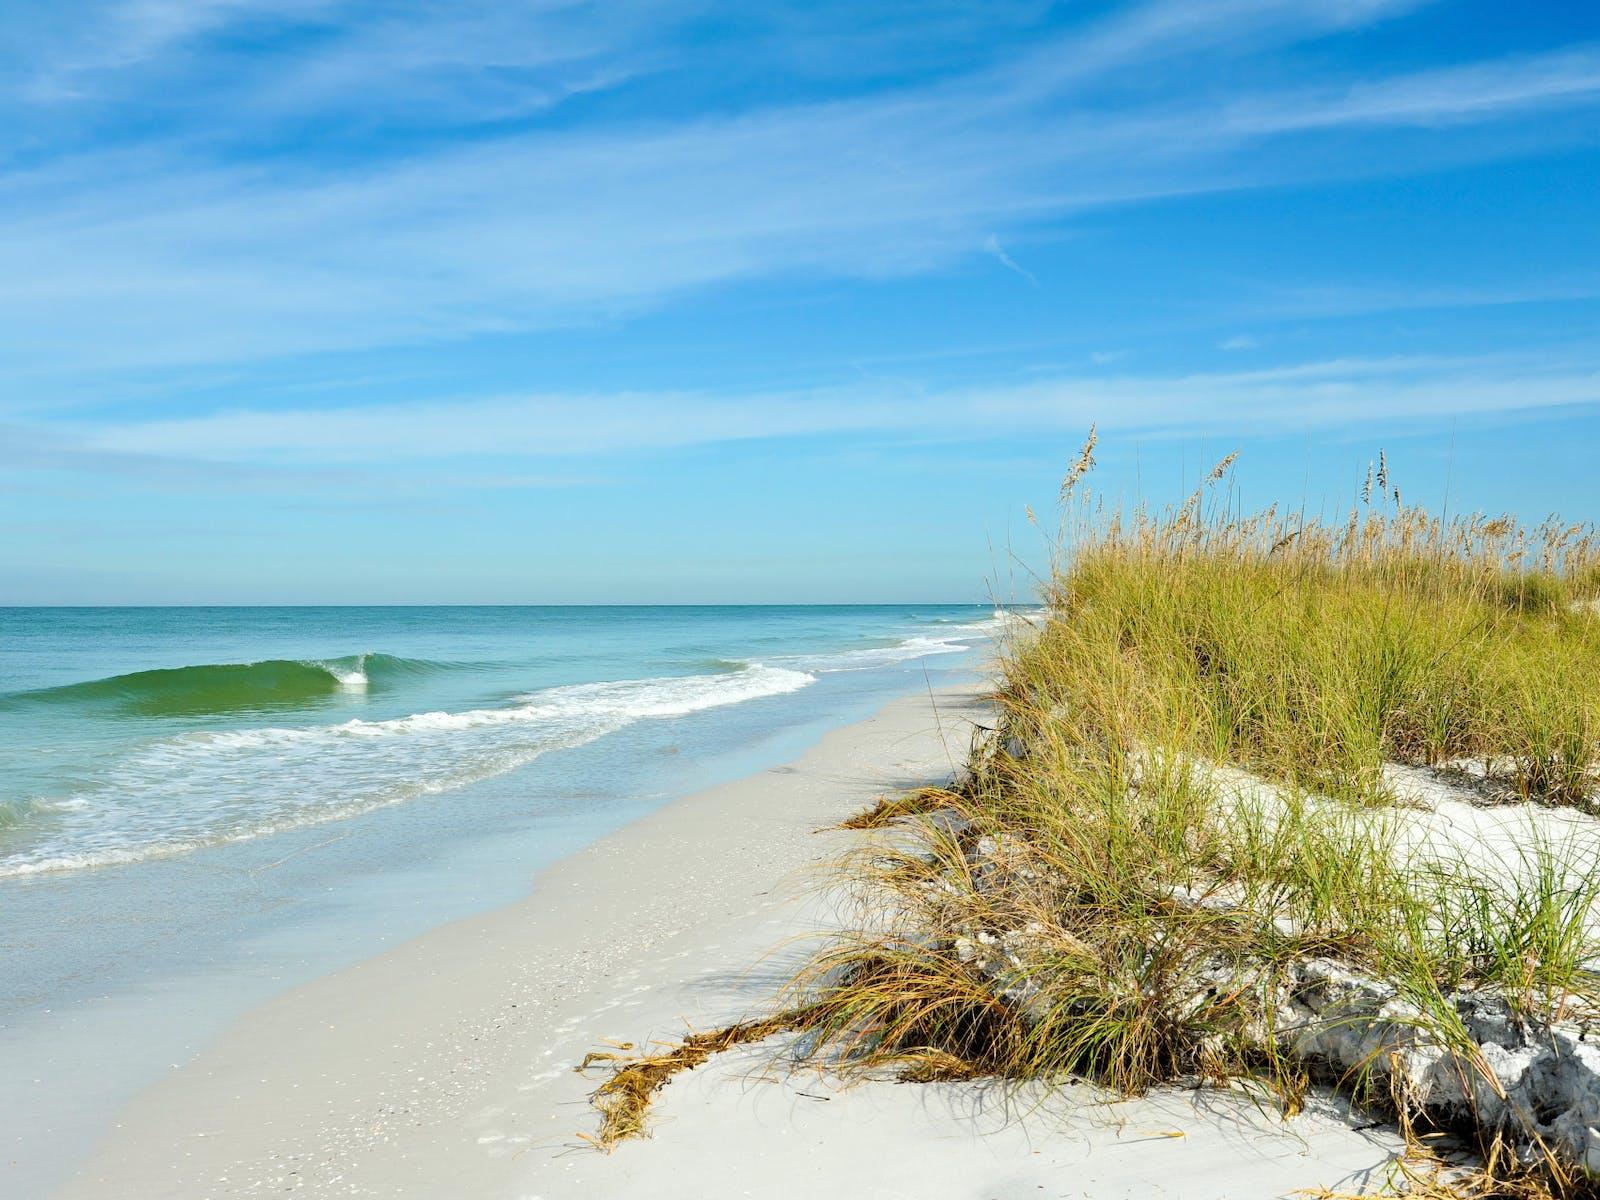 waves washing up on the beach in Anna Maria Island, Florida